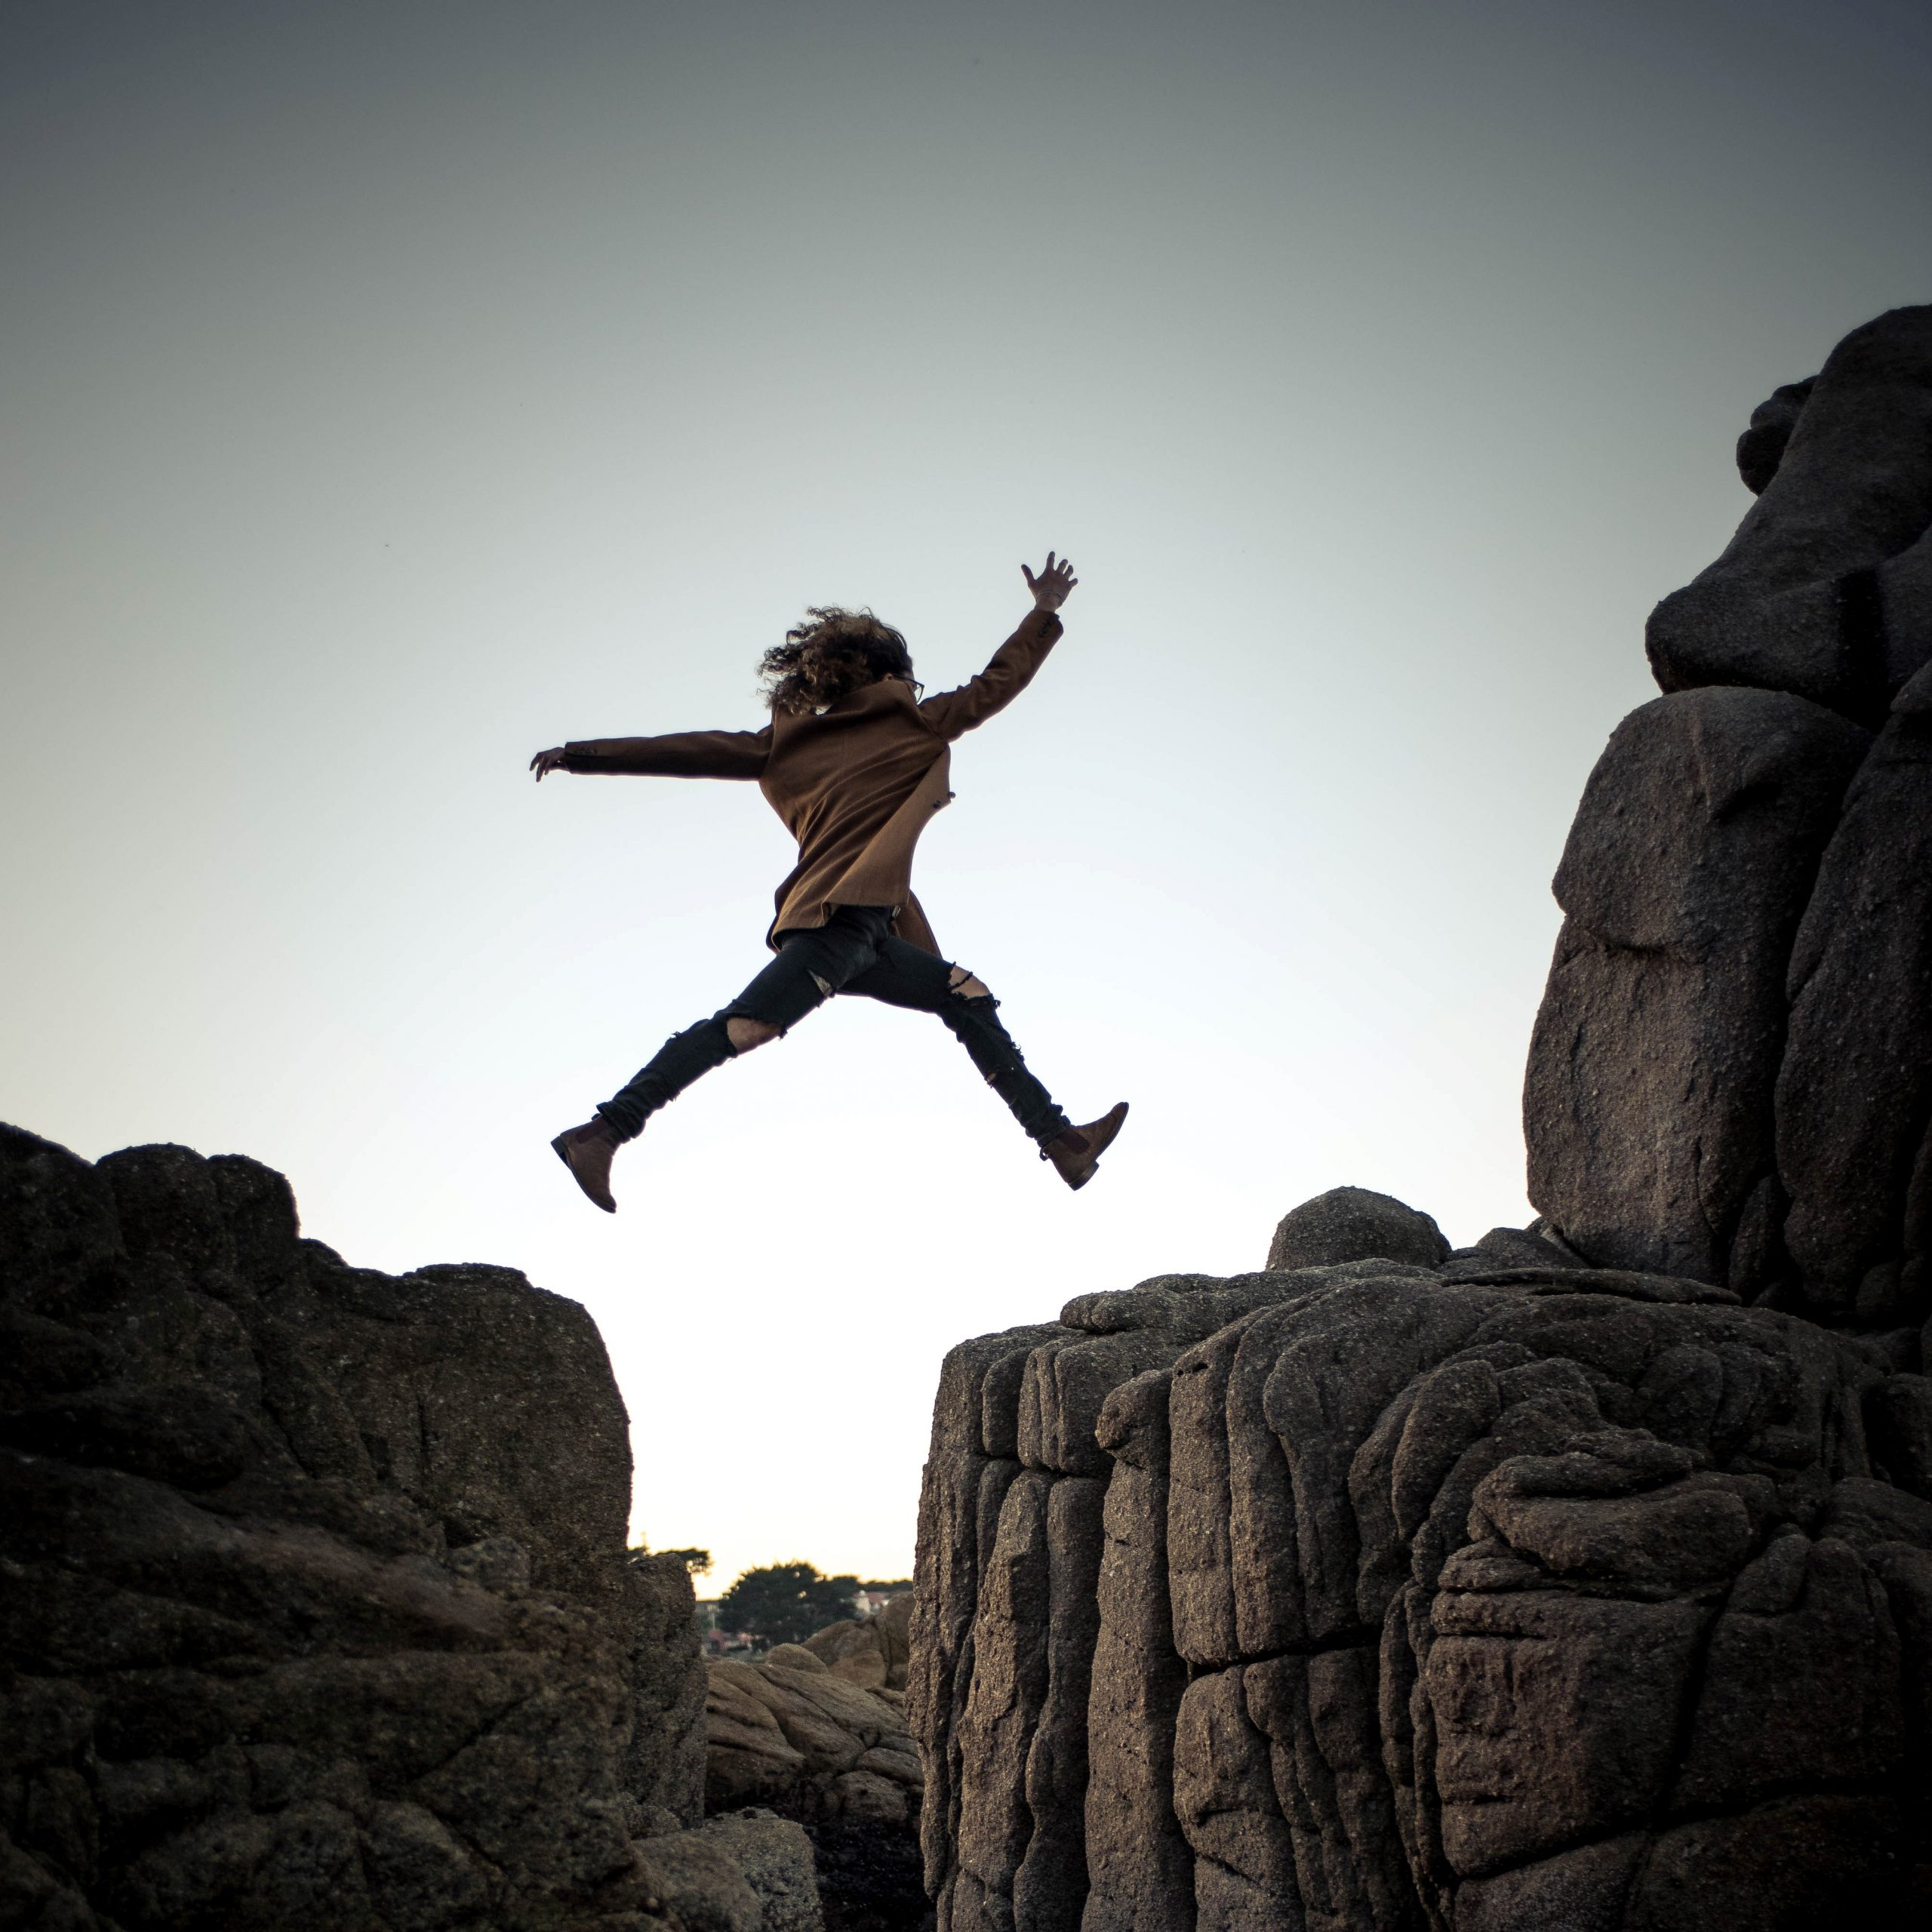 girl jumping across a cliff ridge